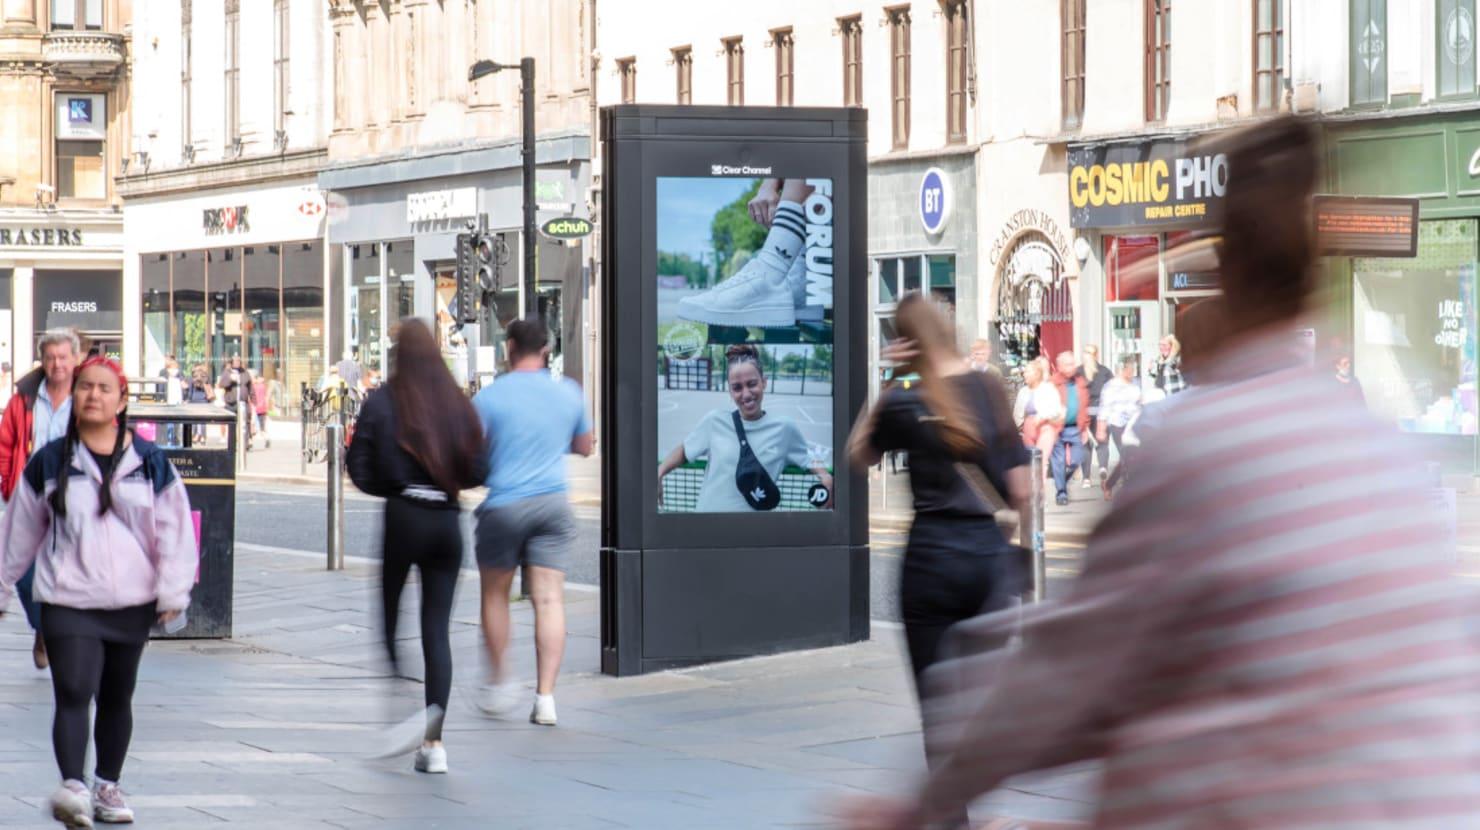 Adshel Live Screen featuring Adidas in Glasgow